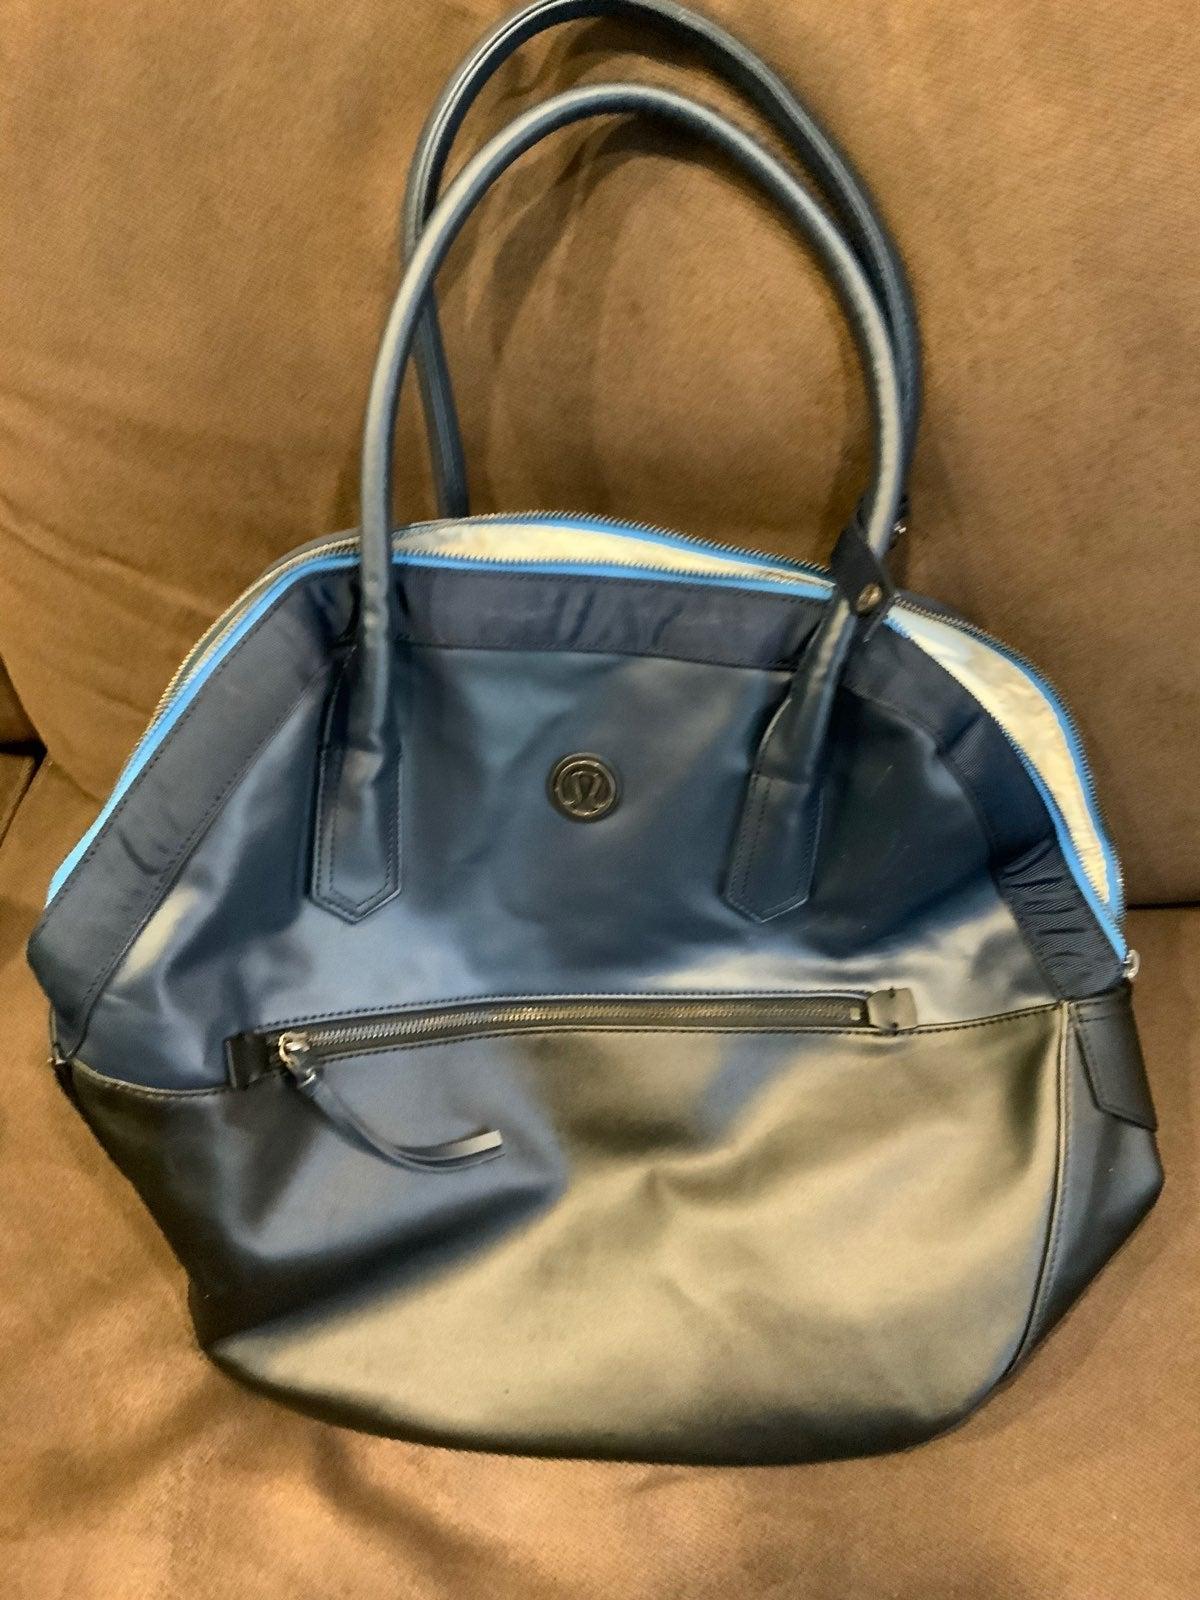 Lululemon Navy blue Yoga Duffle Gym Bag